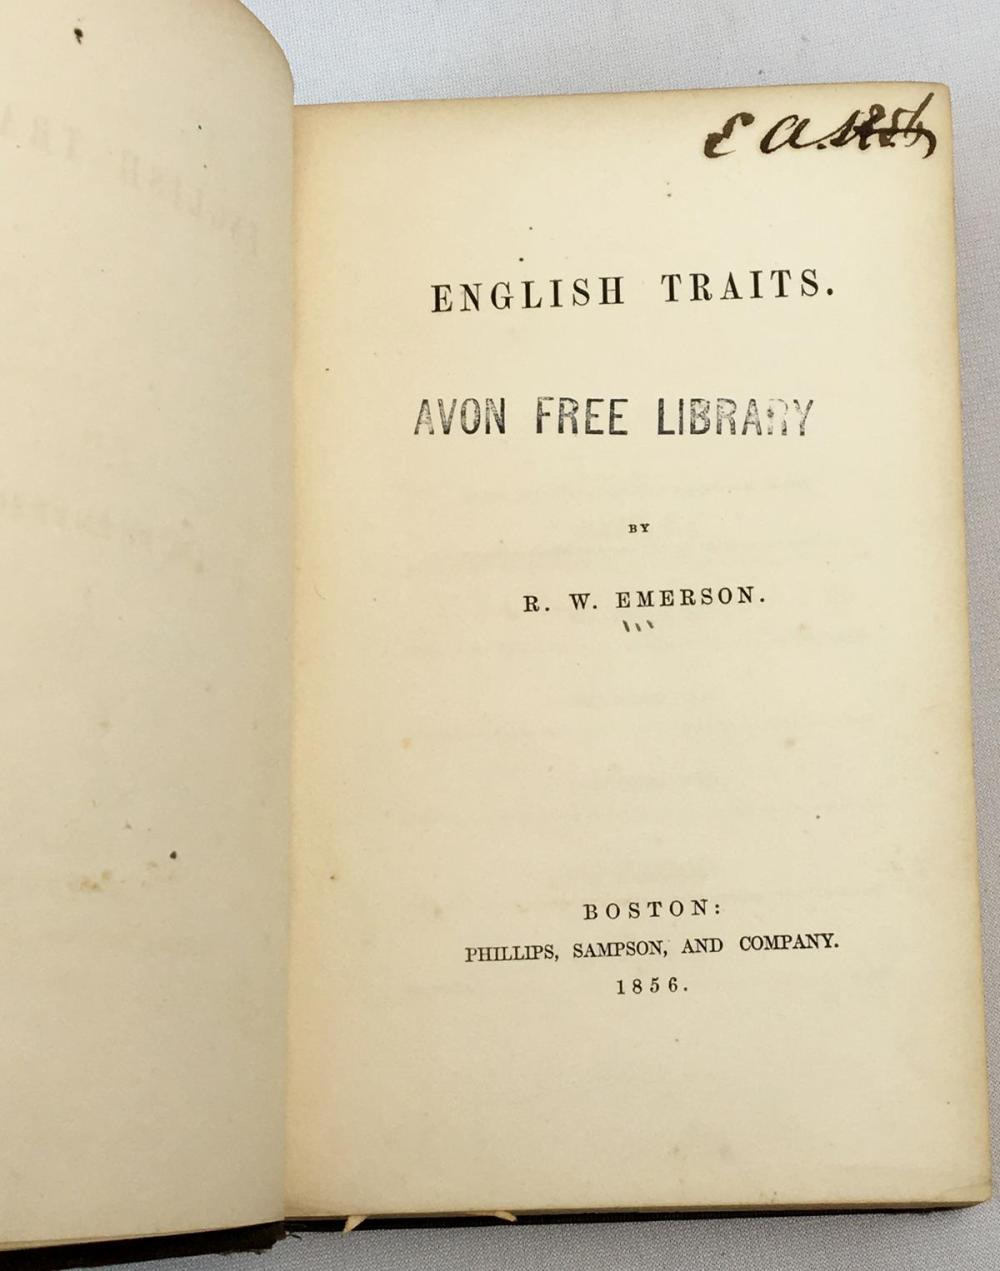 1856 English Traits by R.W. Emerson (Ralph Waldo Emerson) FIRST EDITION